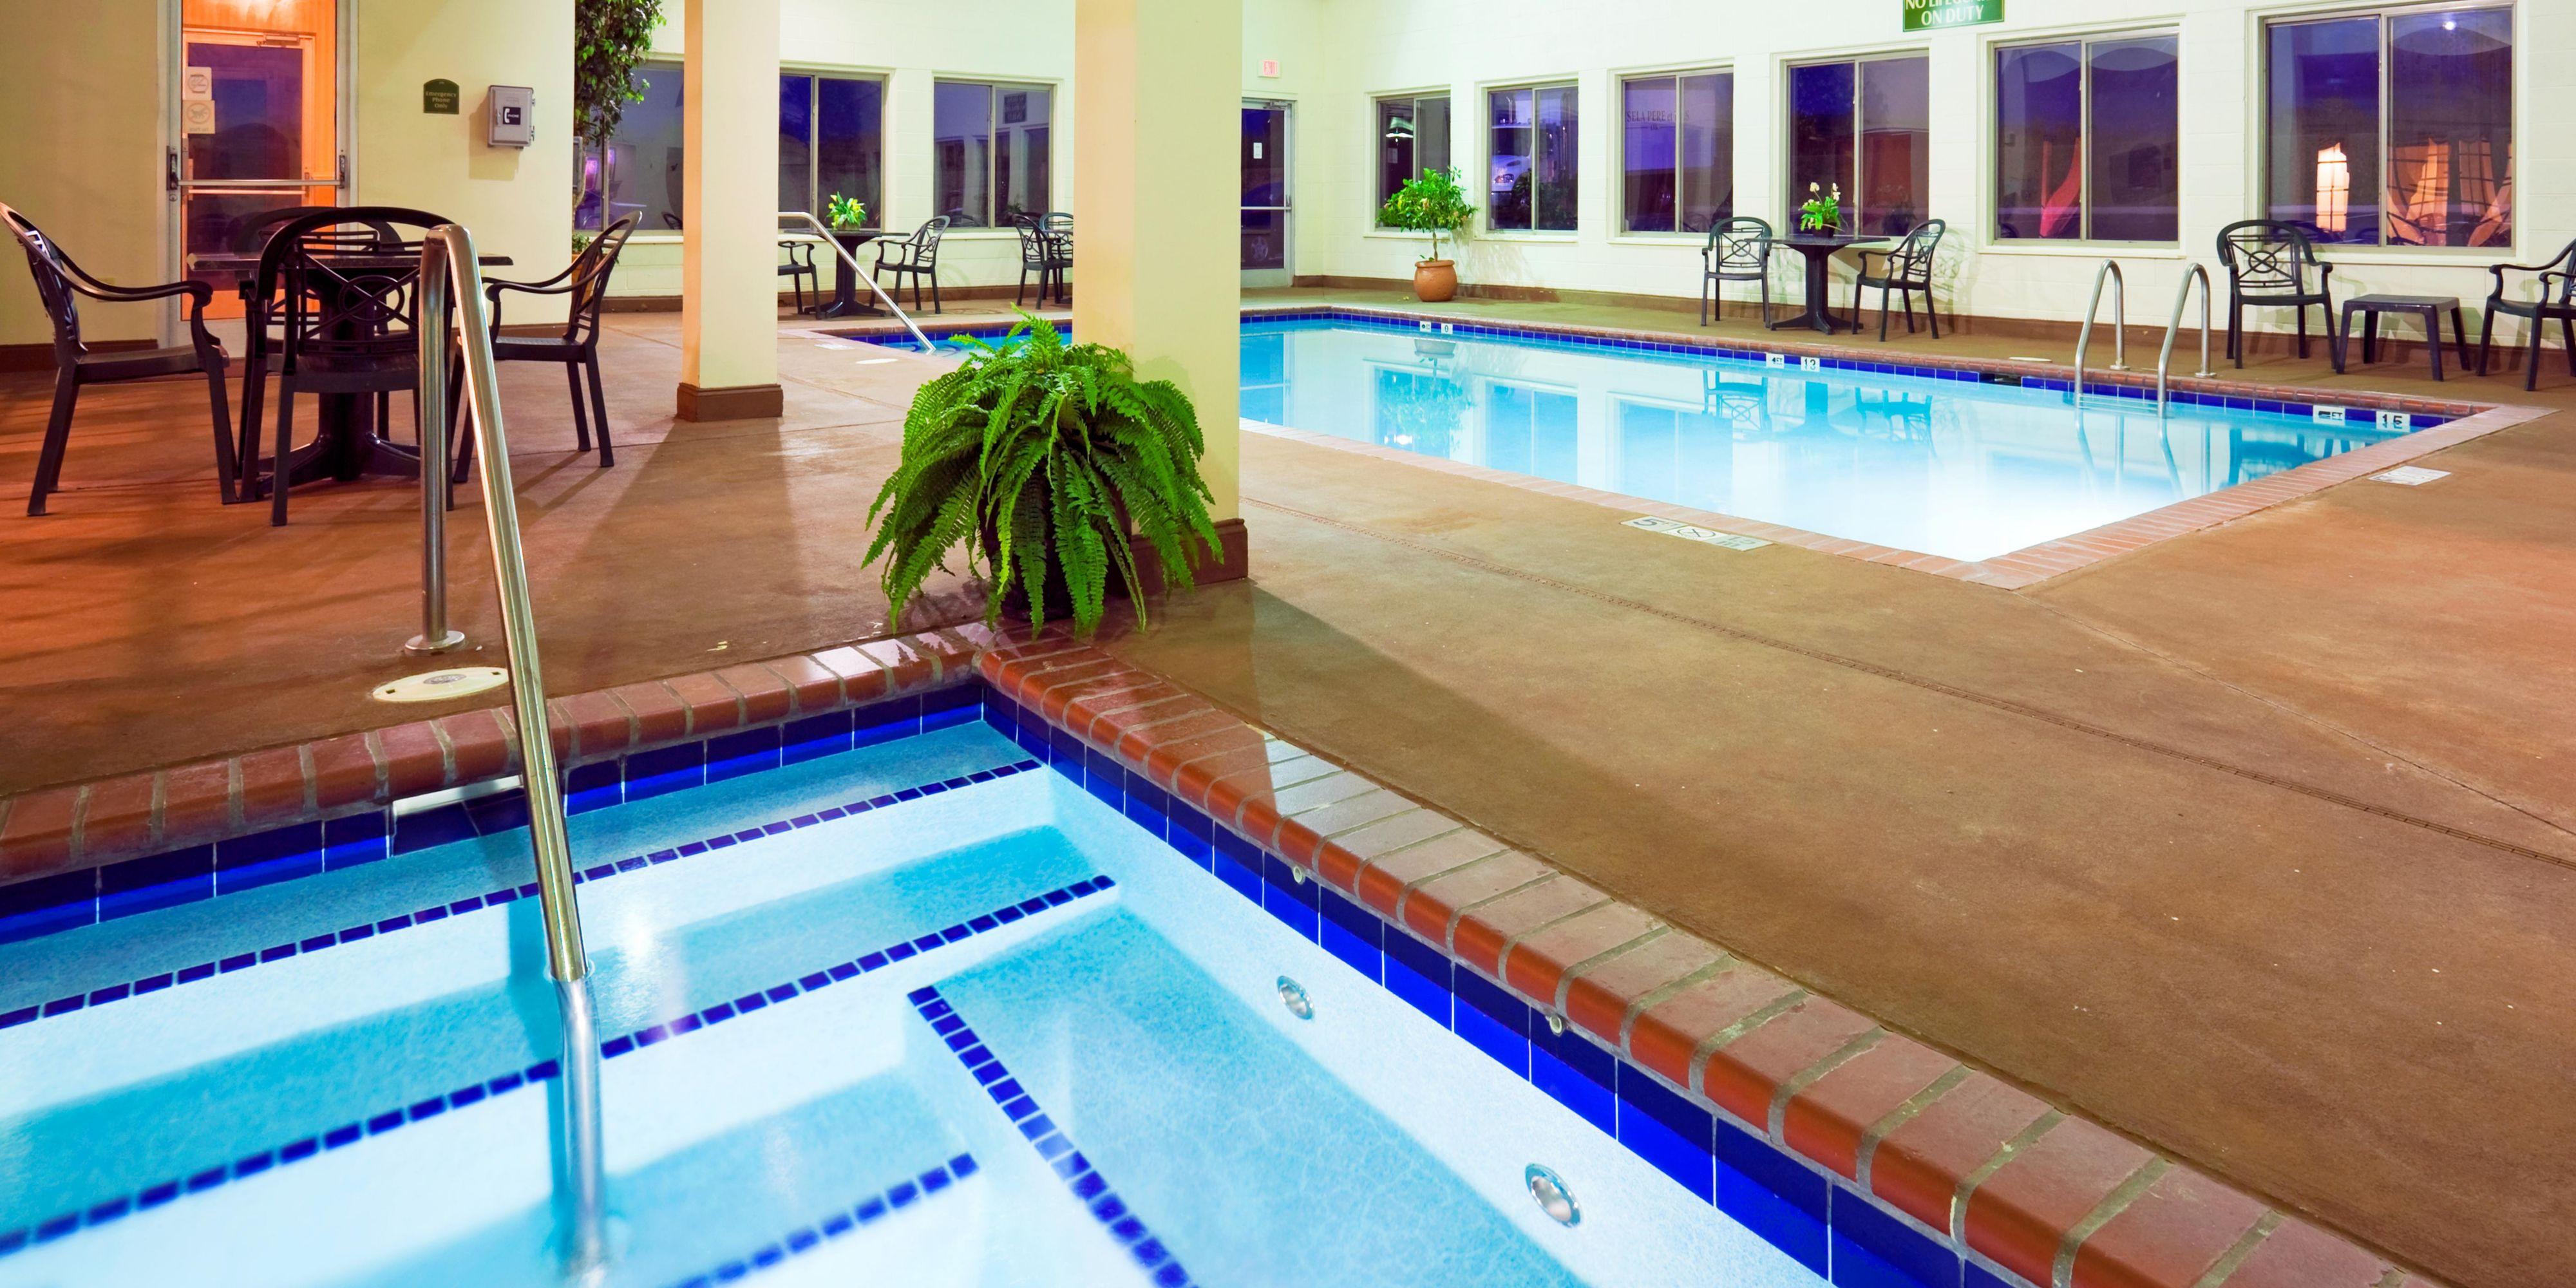 Holiday Inn Express Athens 2532630984 2x1